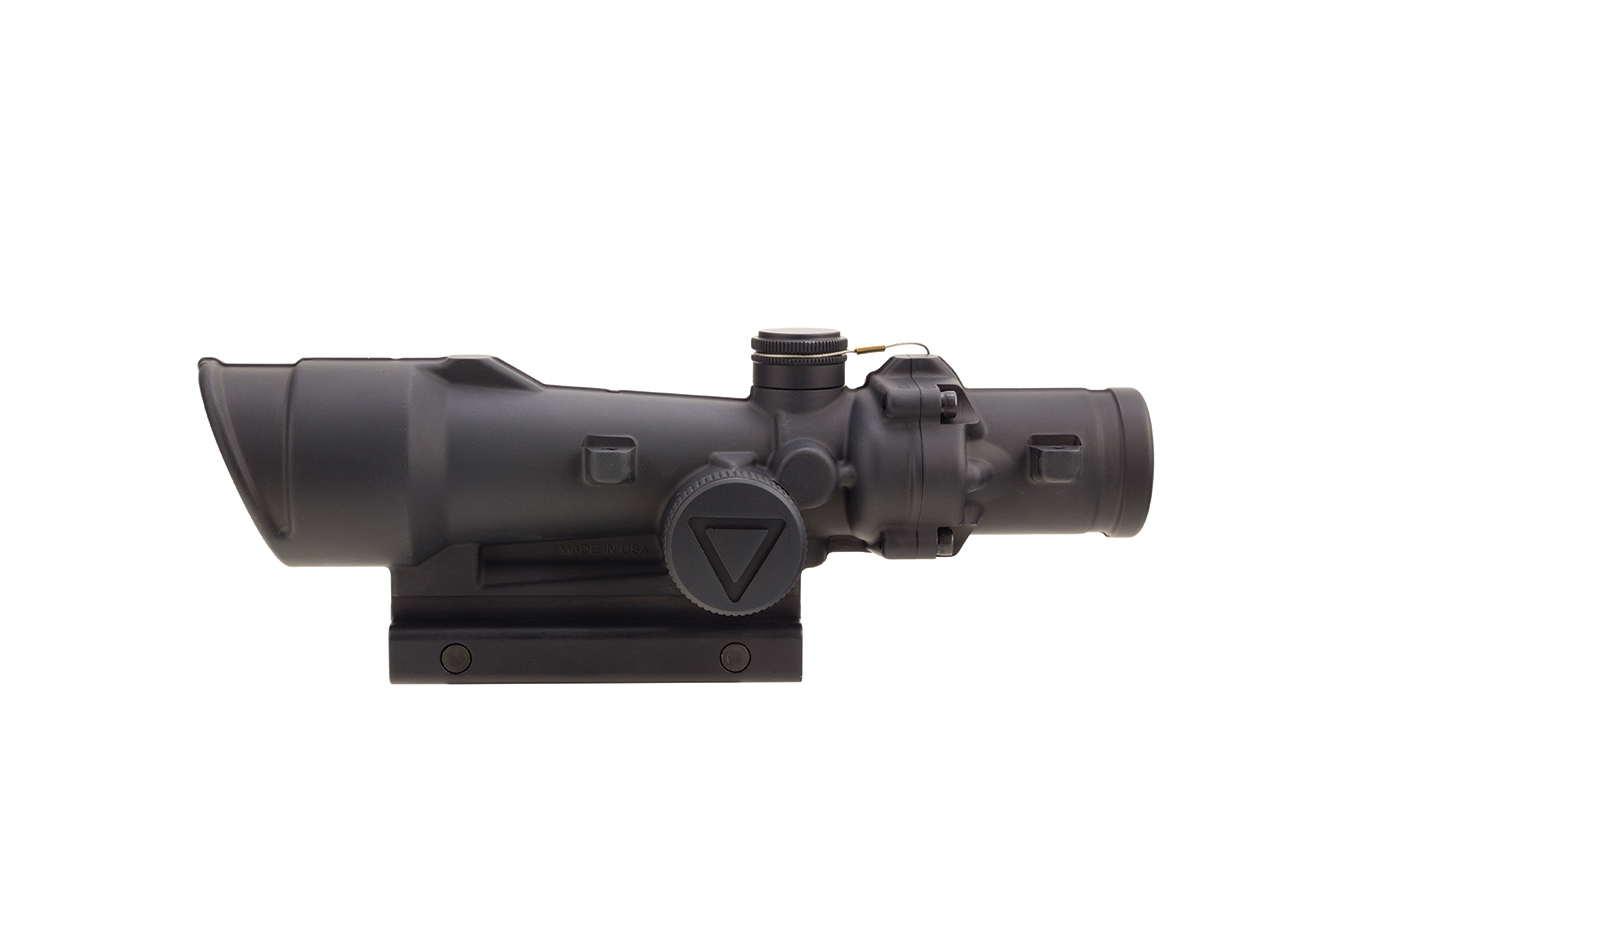 TA110-D-100500 angle 2